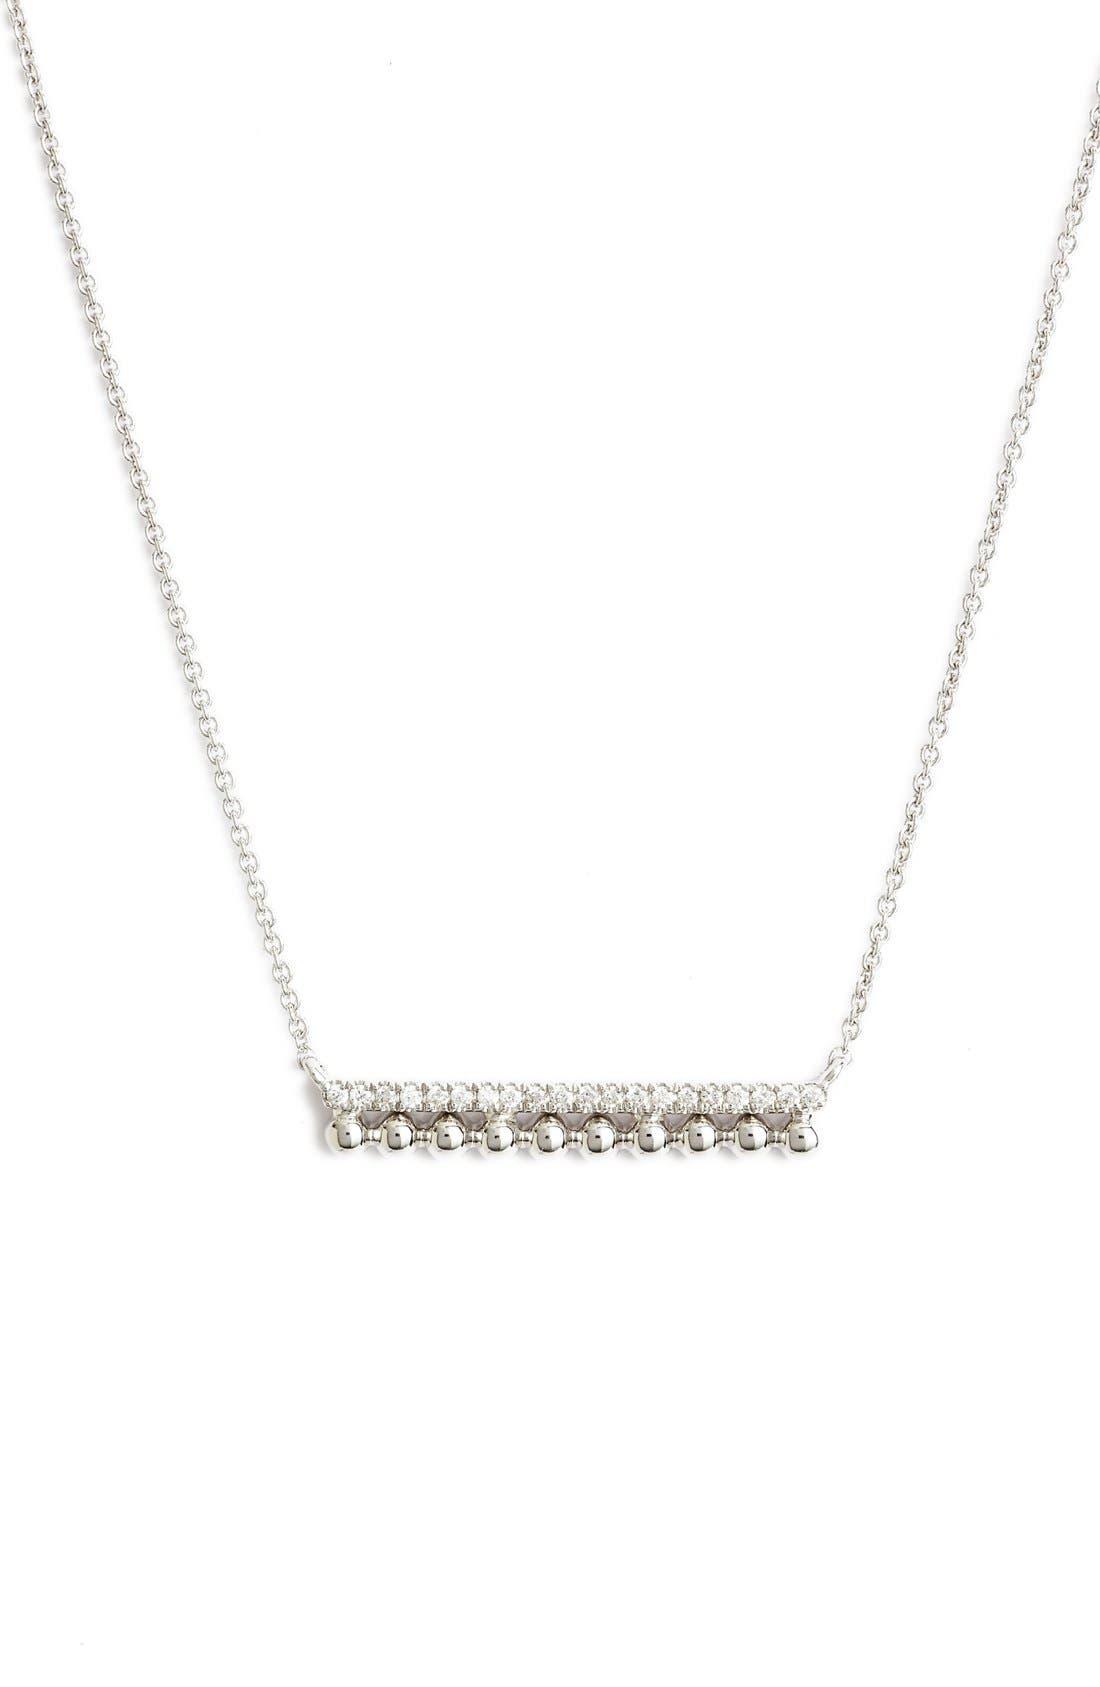 Alternate Image 1 Selected - Dana Rebecca Designs 'Poppy Rae' Bar Pendant Necklace